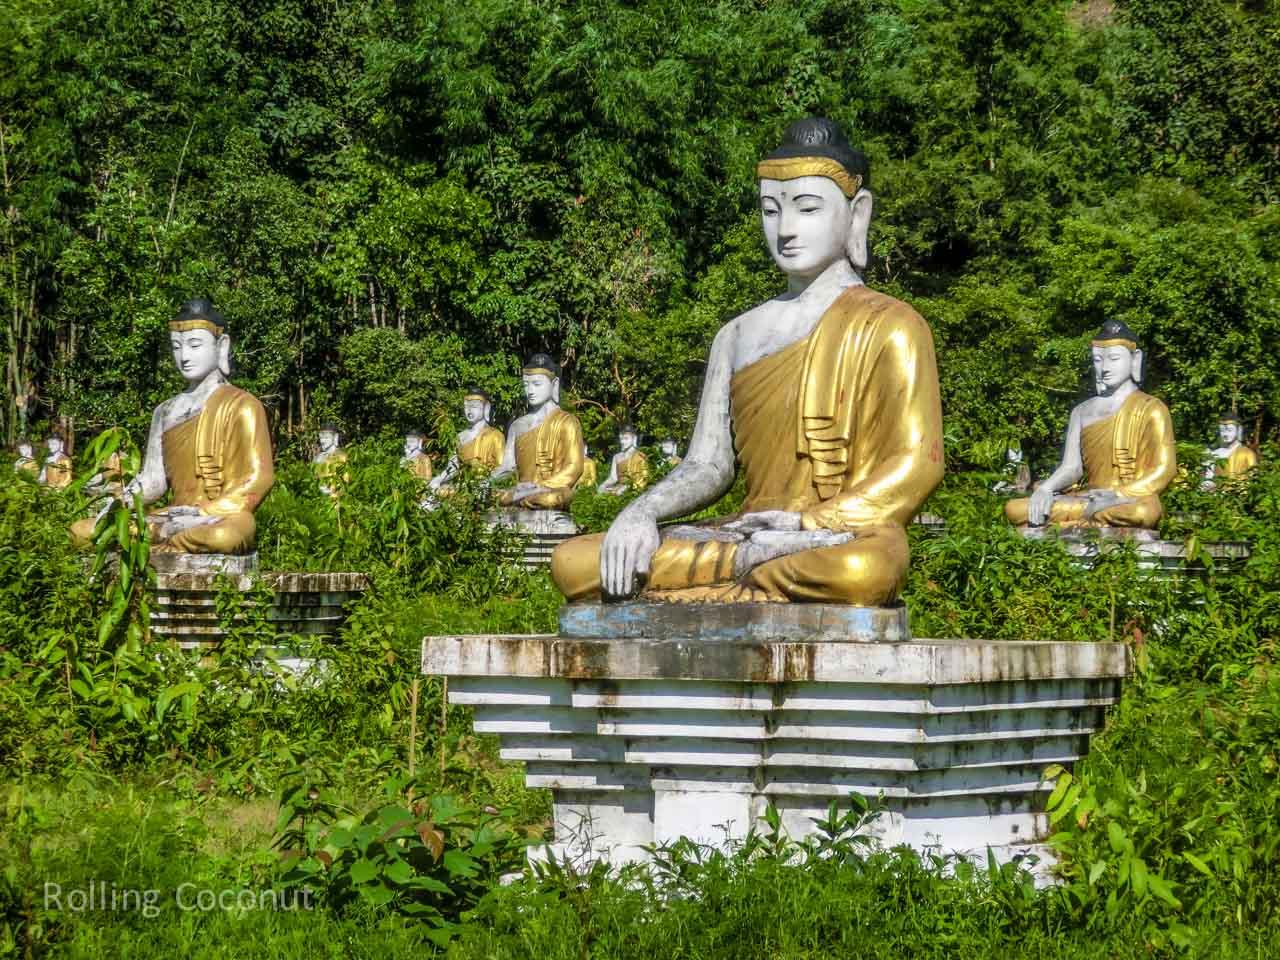 Hpaan Buddhas Travel Ooaworld Rolling Coconut Photo Ooaworld